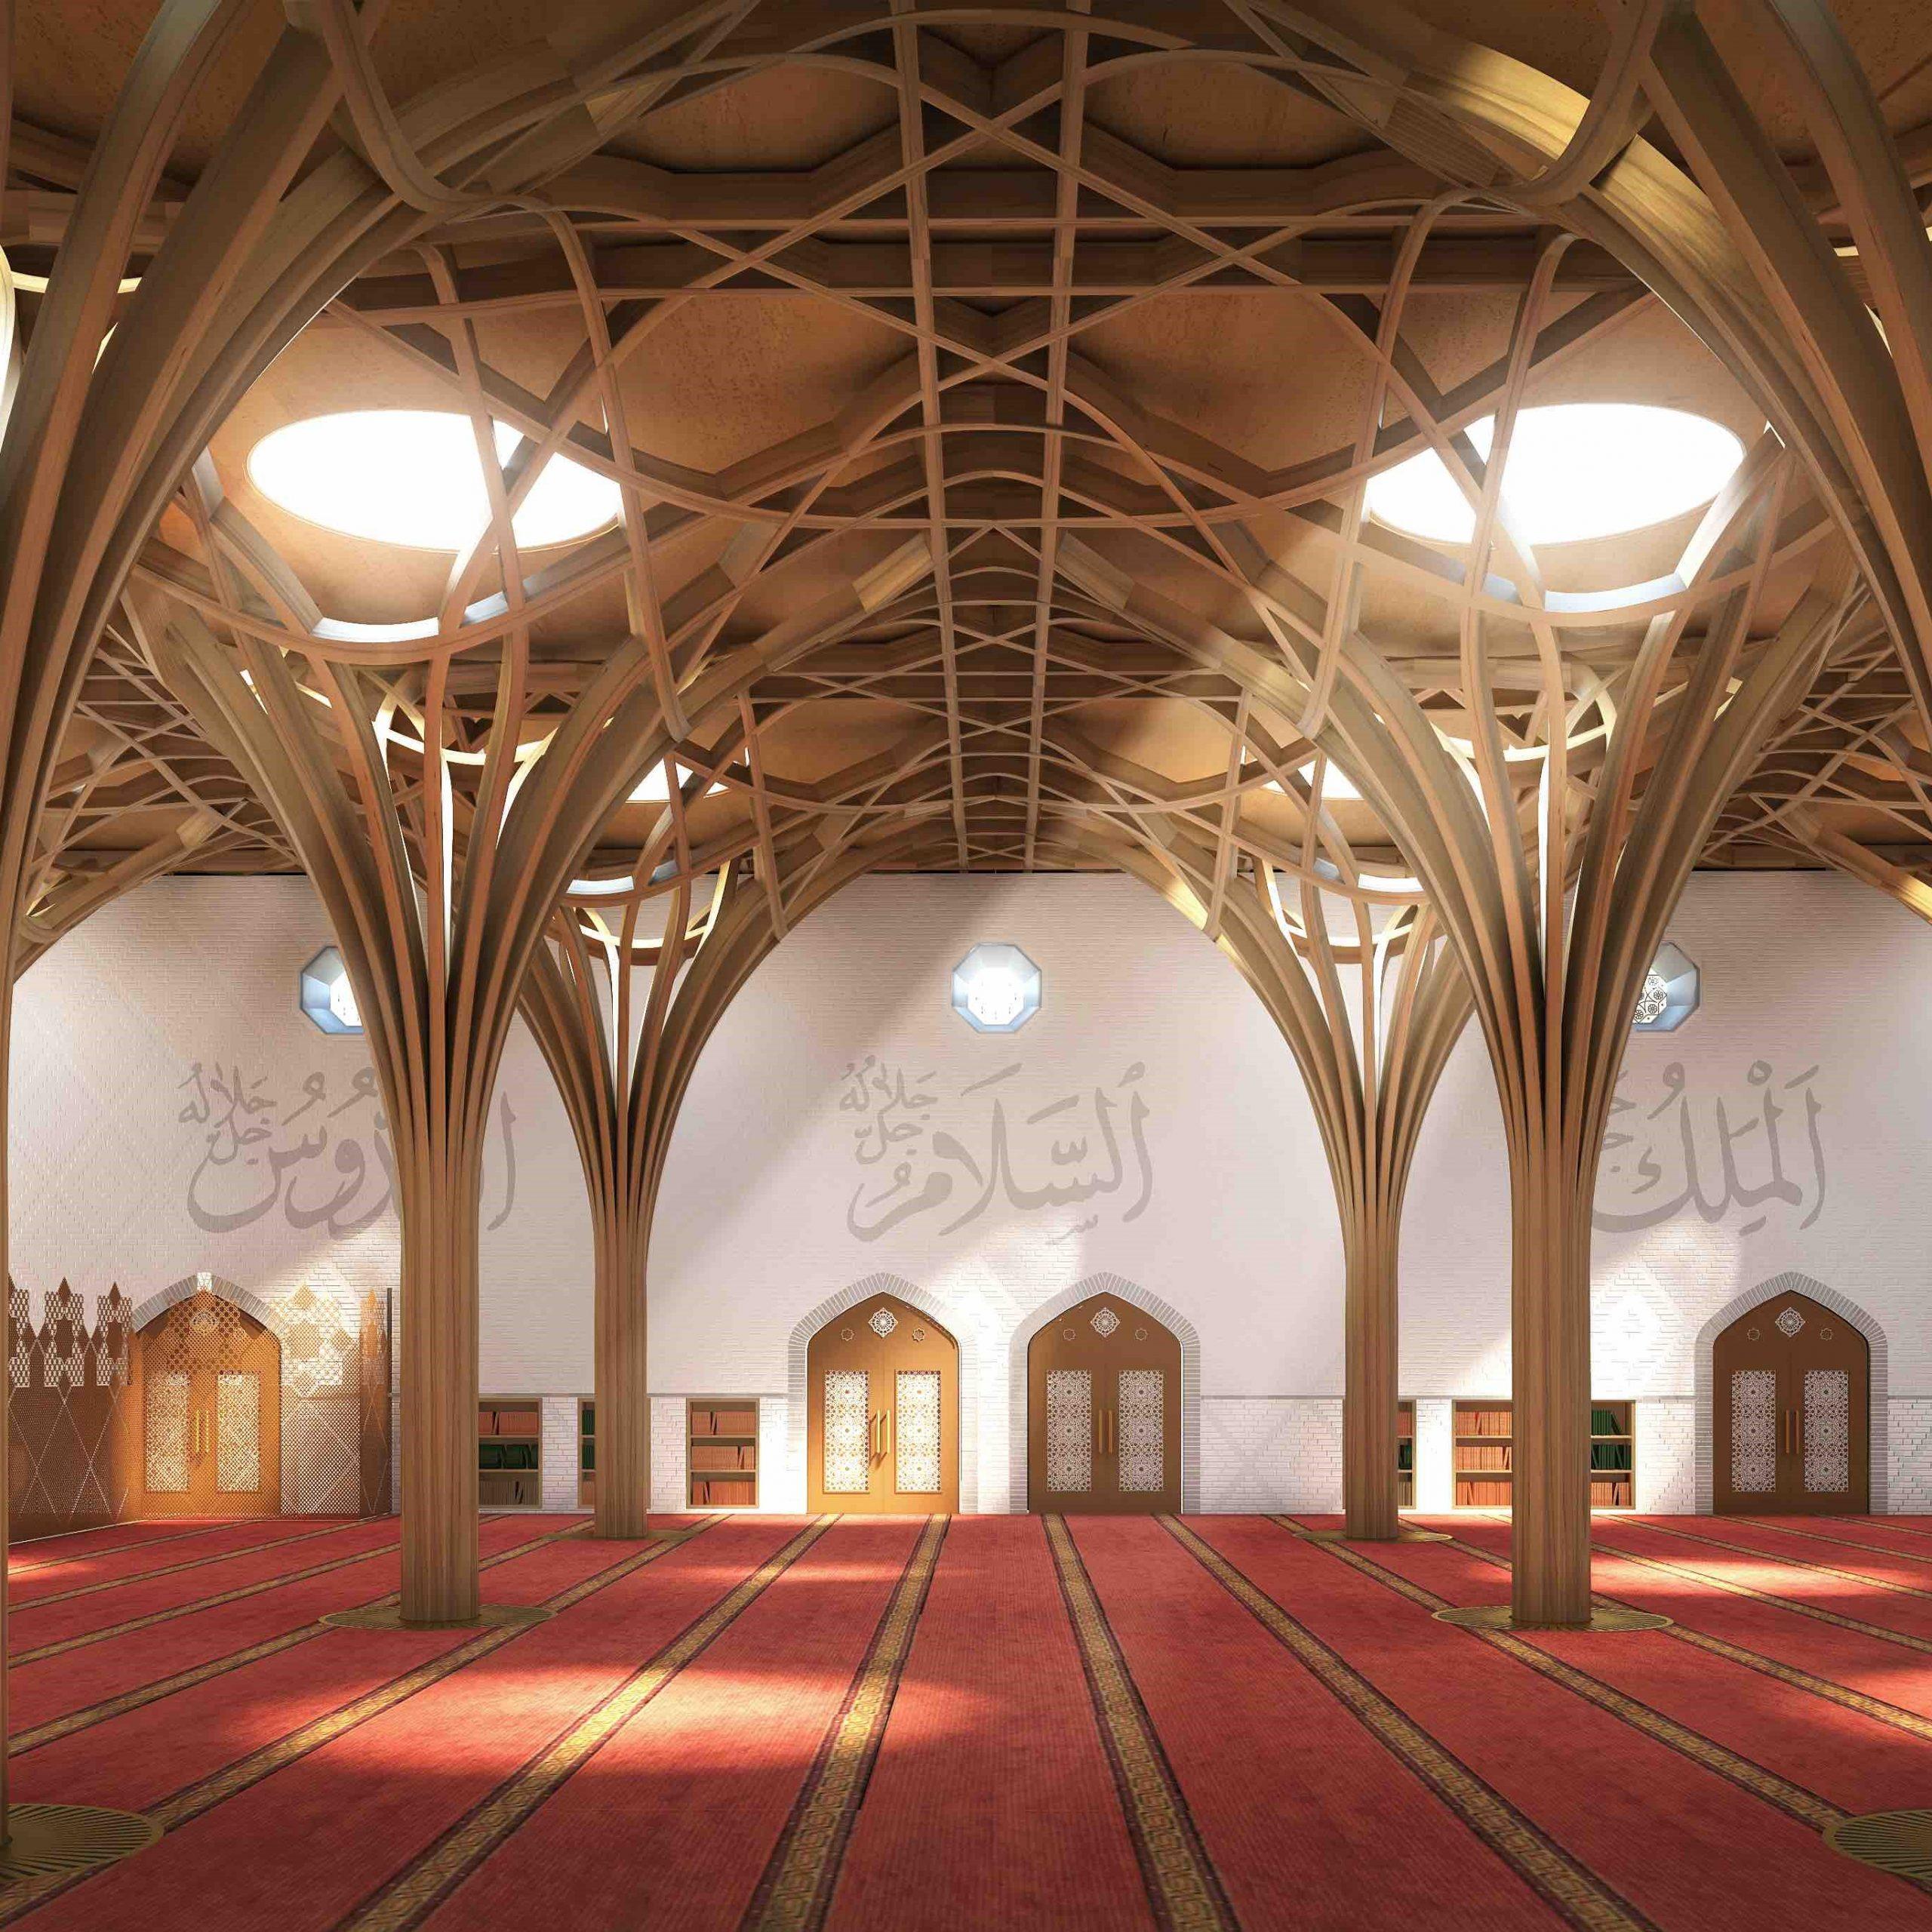 Thumbnail image for Cambridge Mosque: CB1